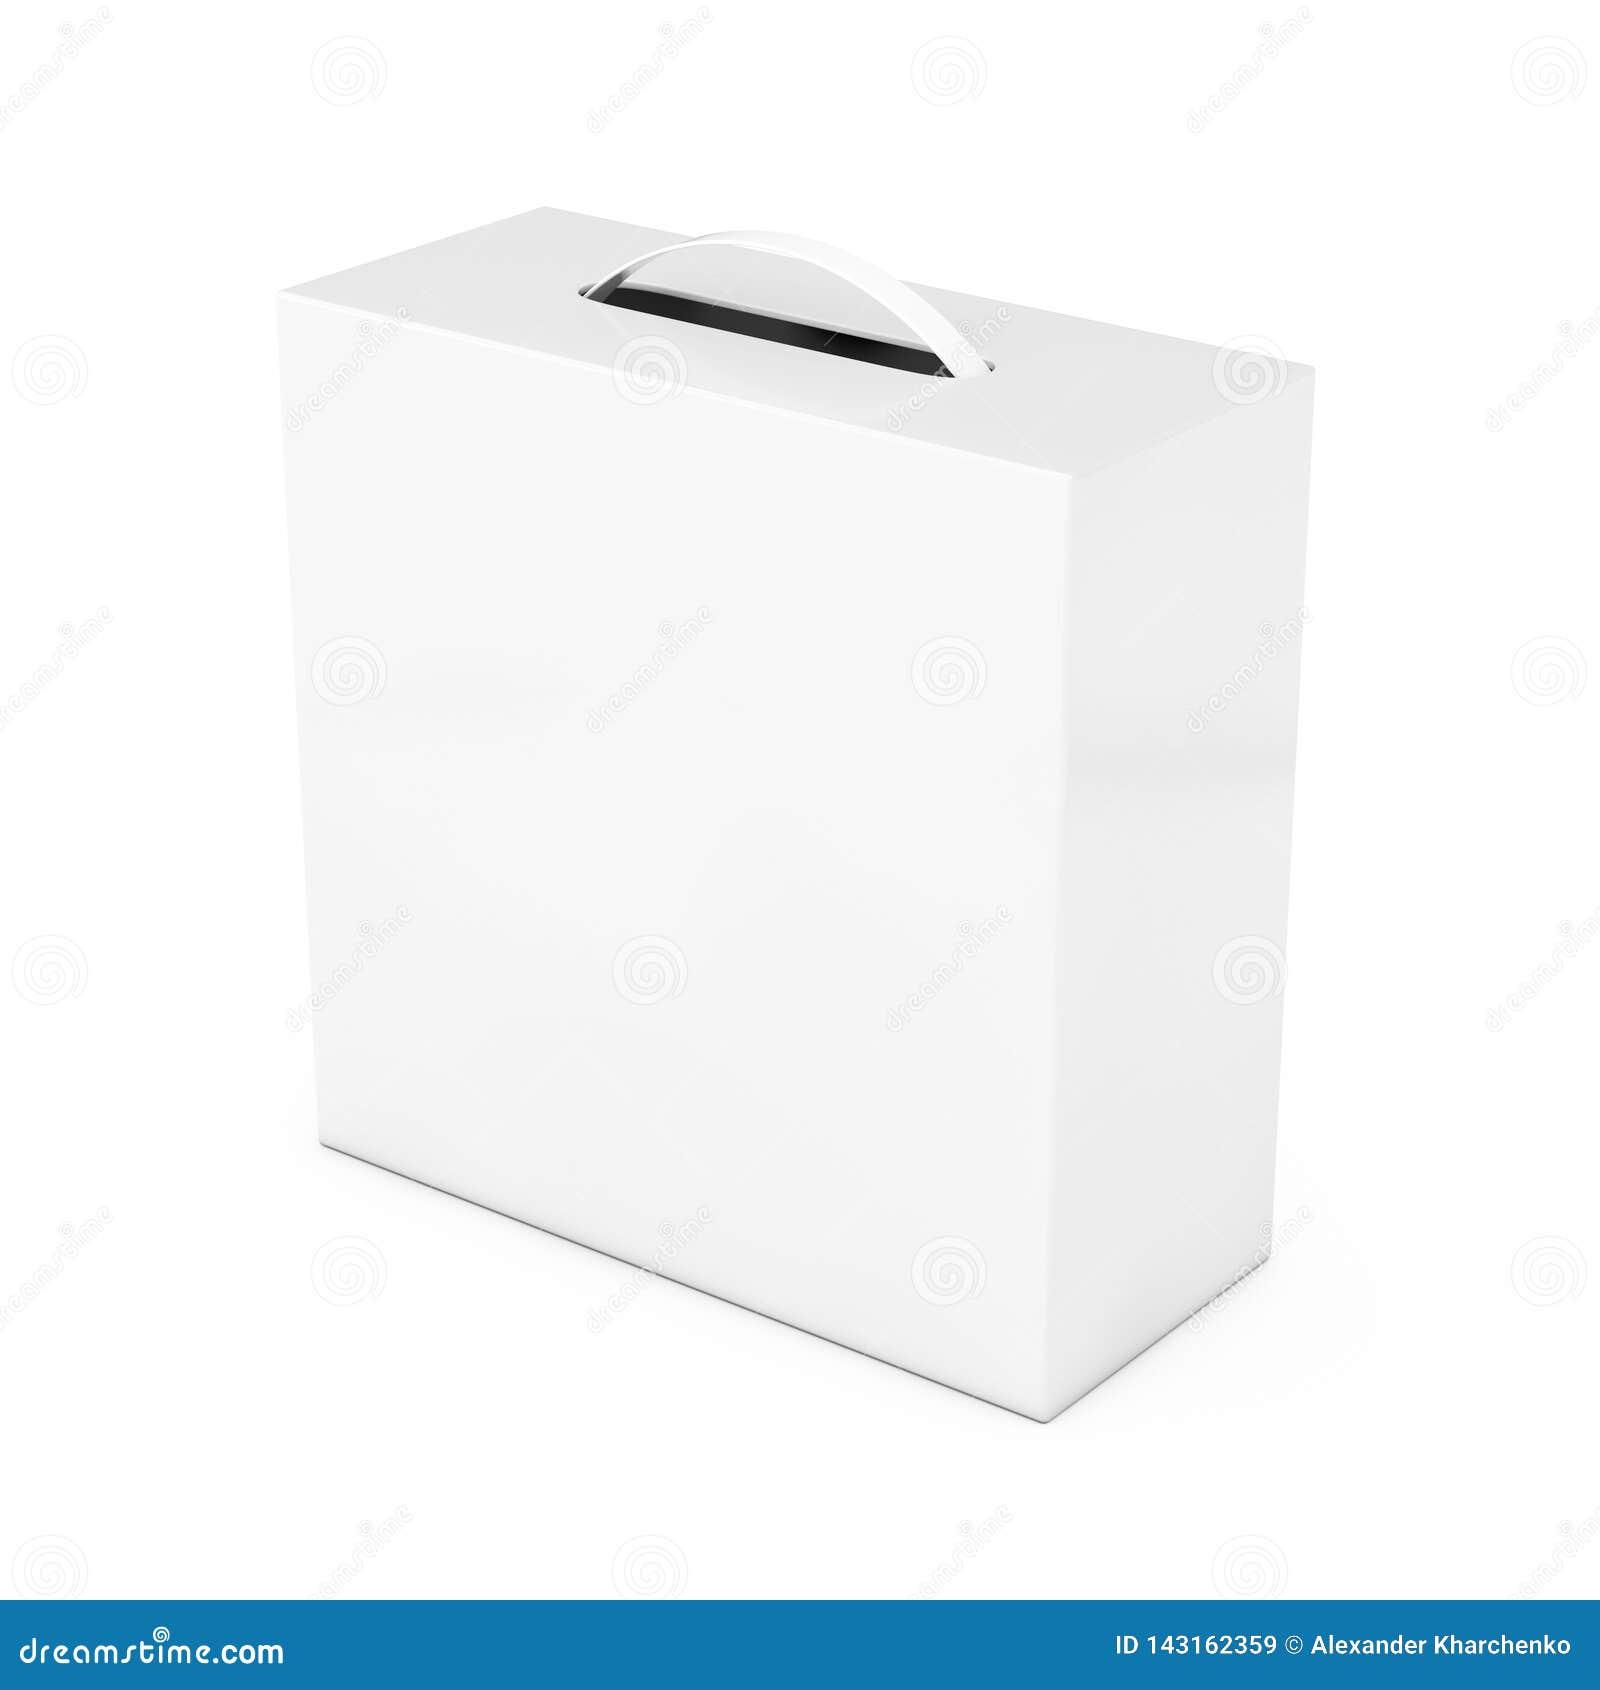 Blank White Cardboard Box Mockup With Plastic Handle  3d Rendering